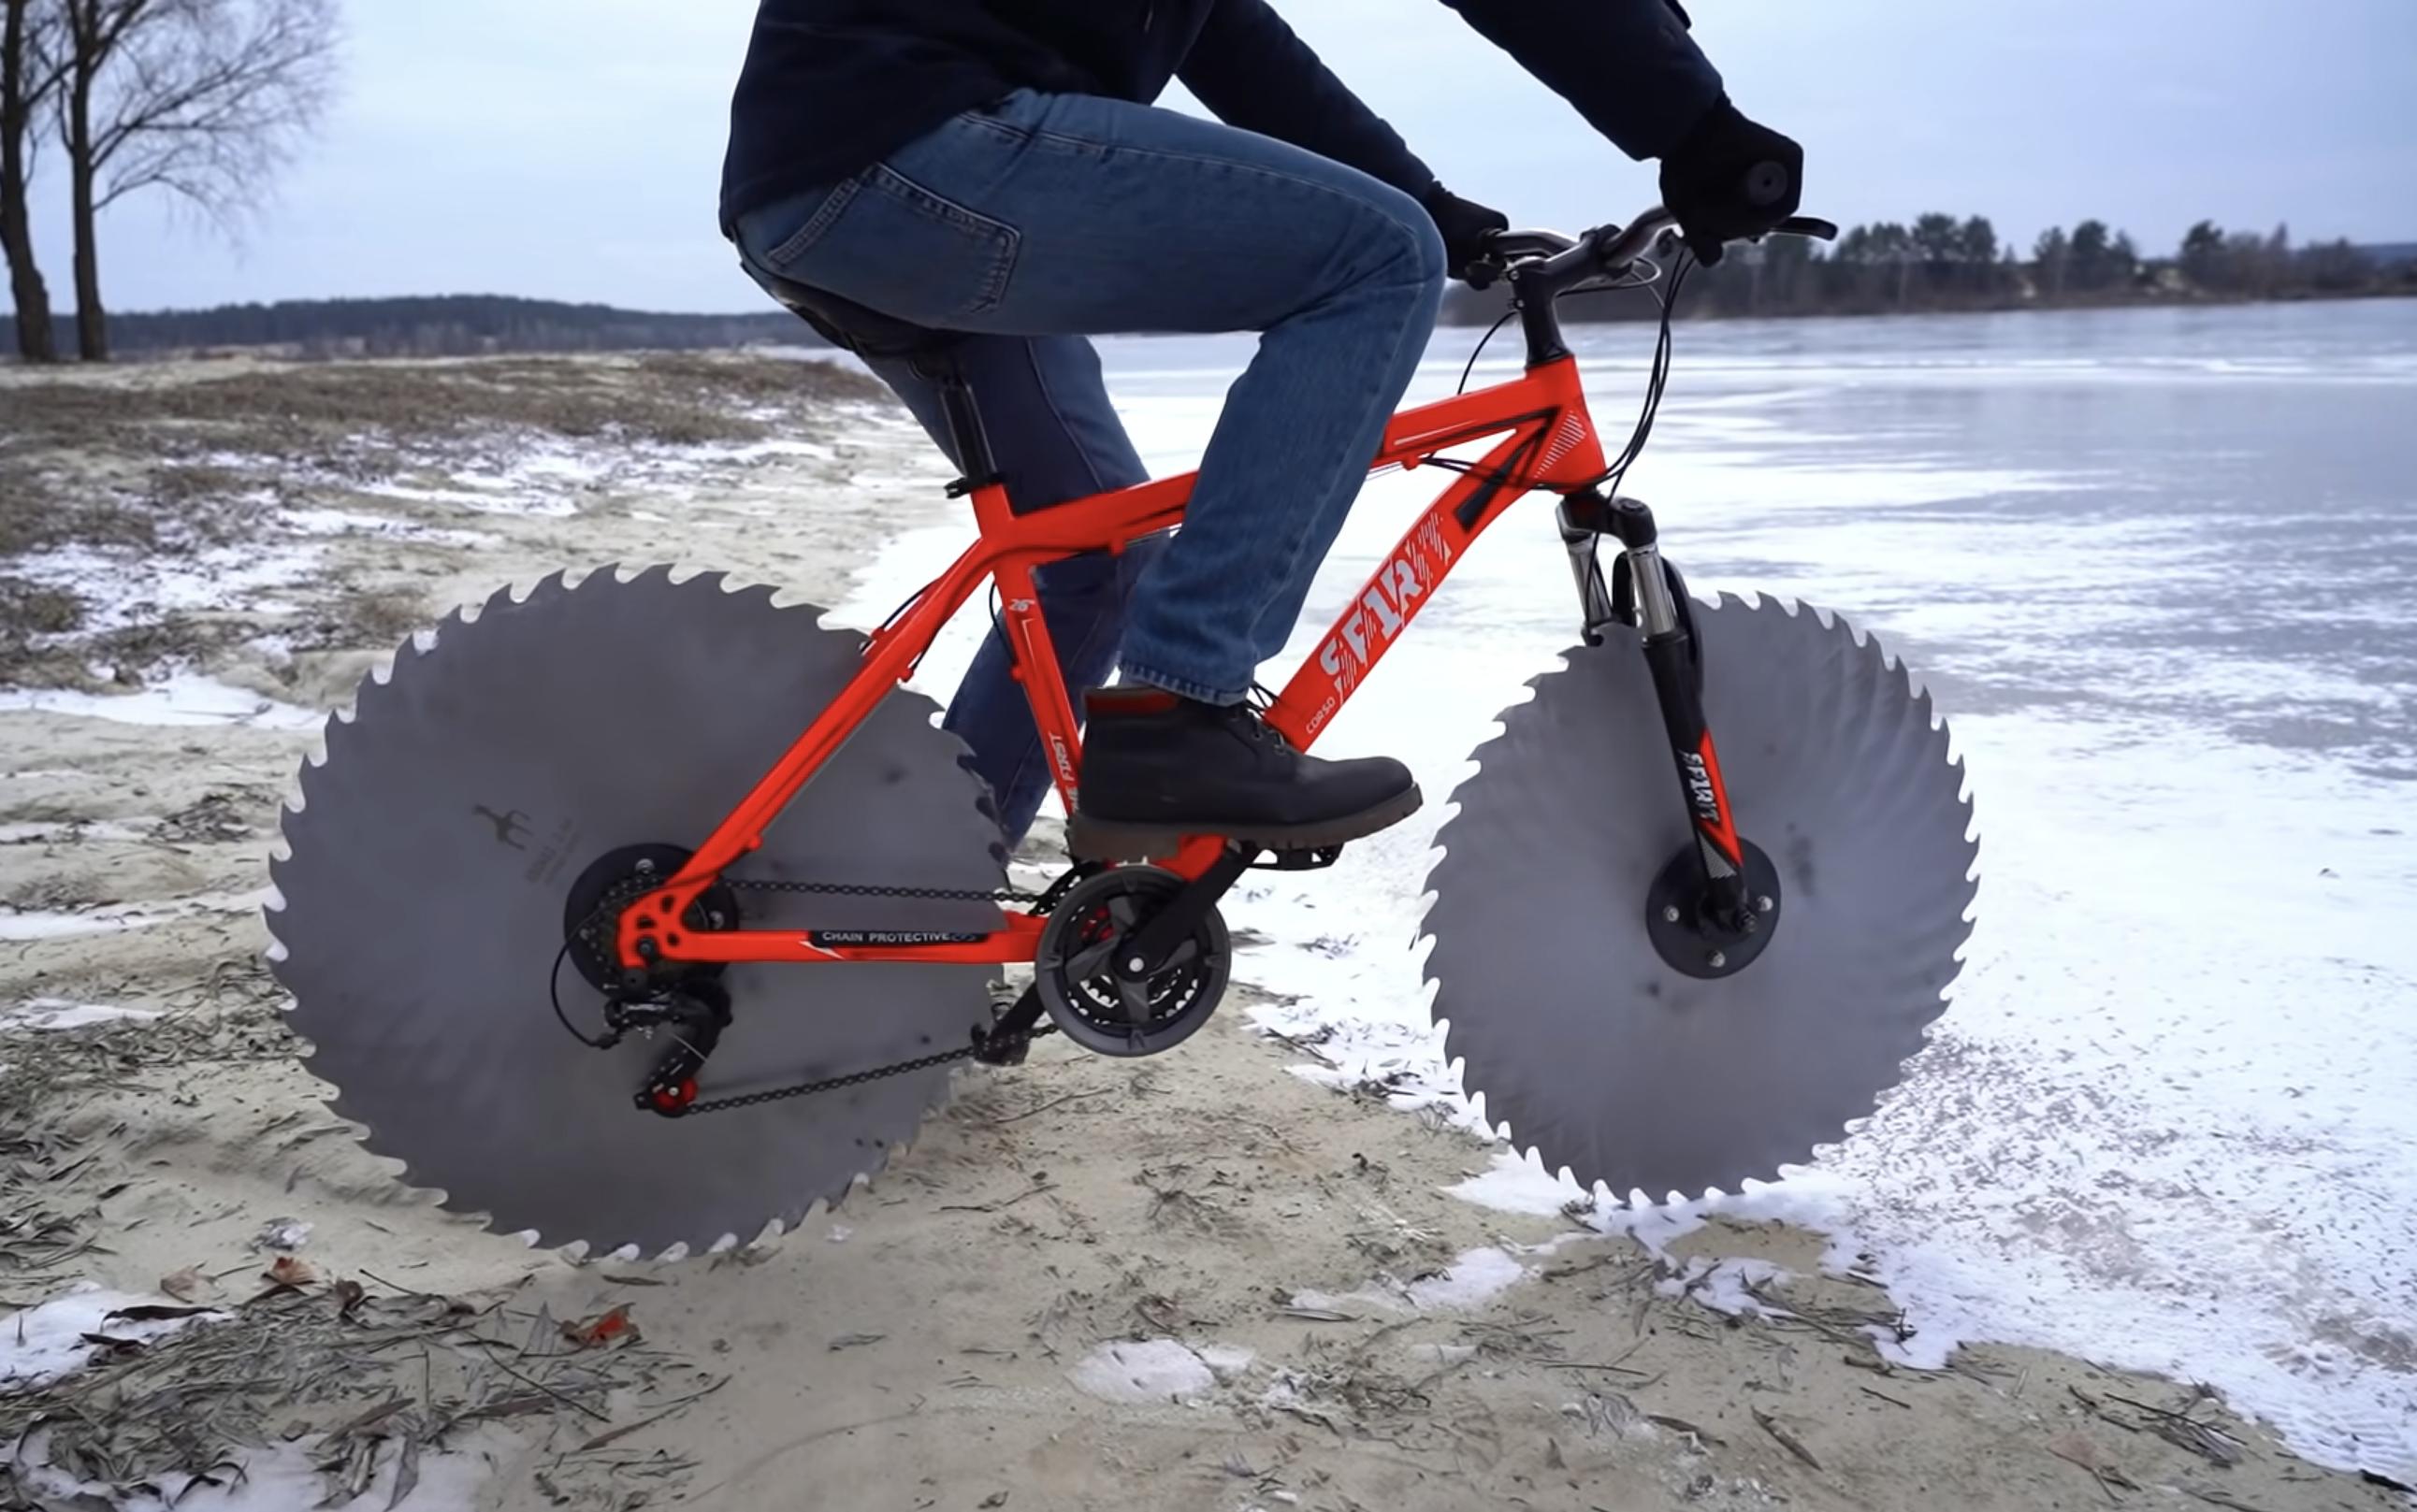 icecycle saw bike